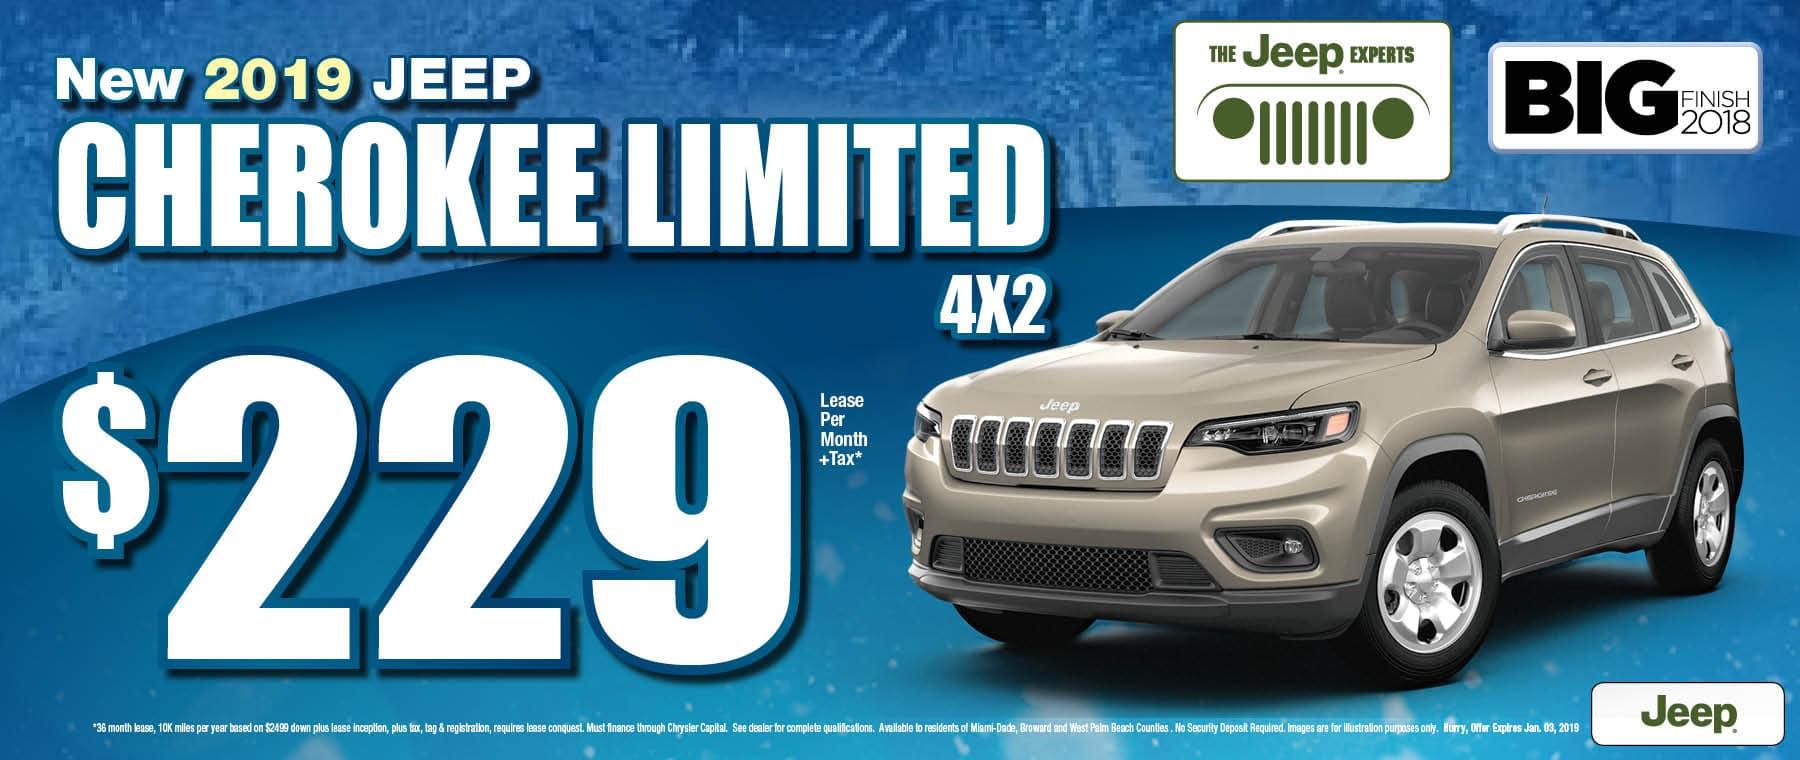 2019 Cherokee $229 Lease